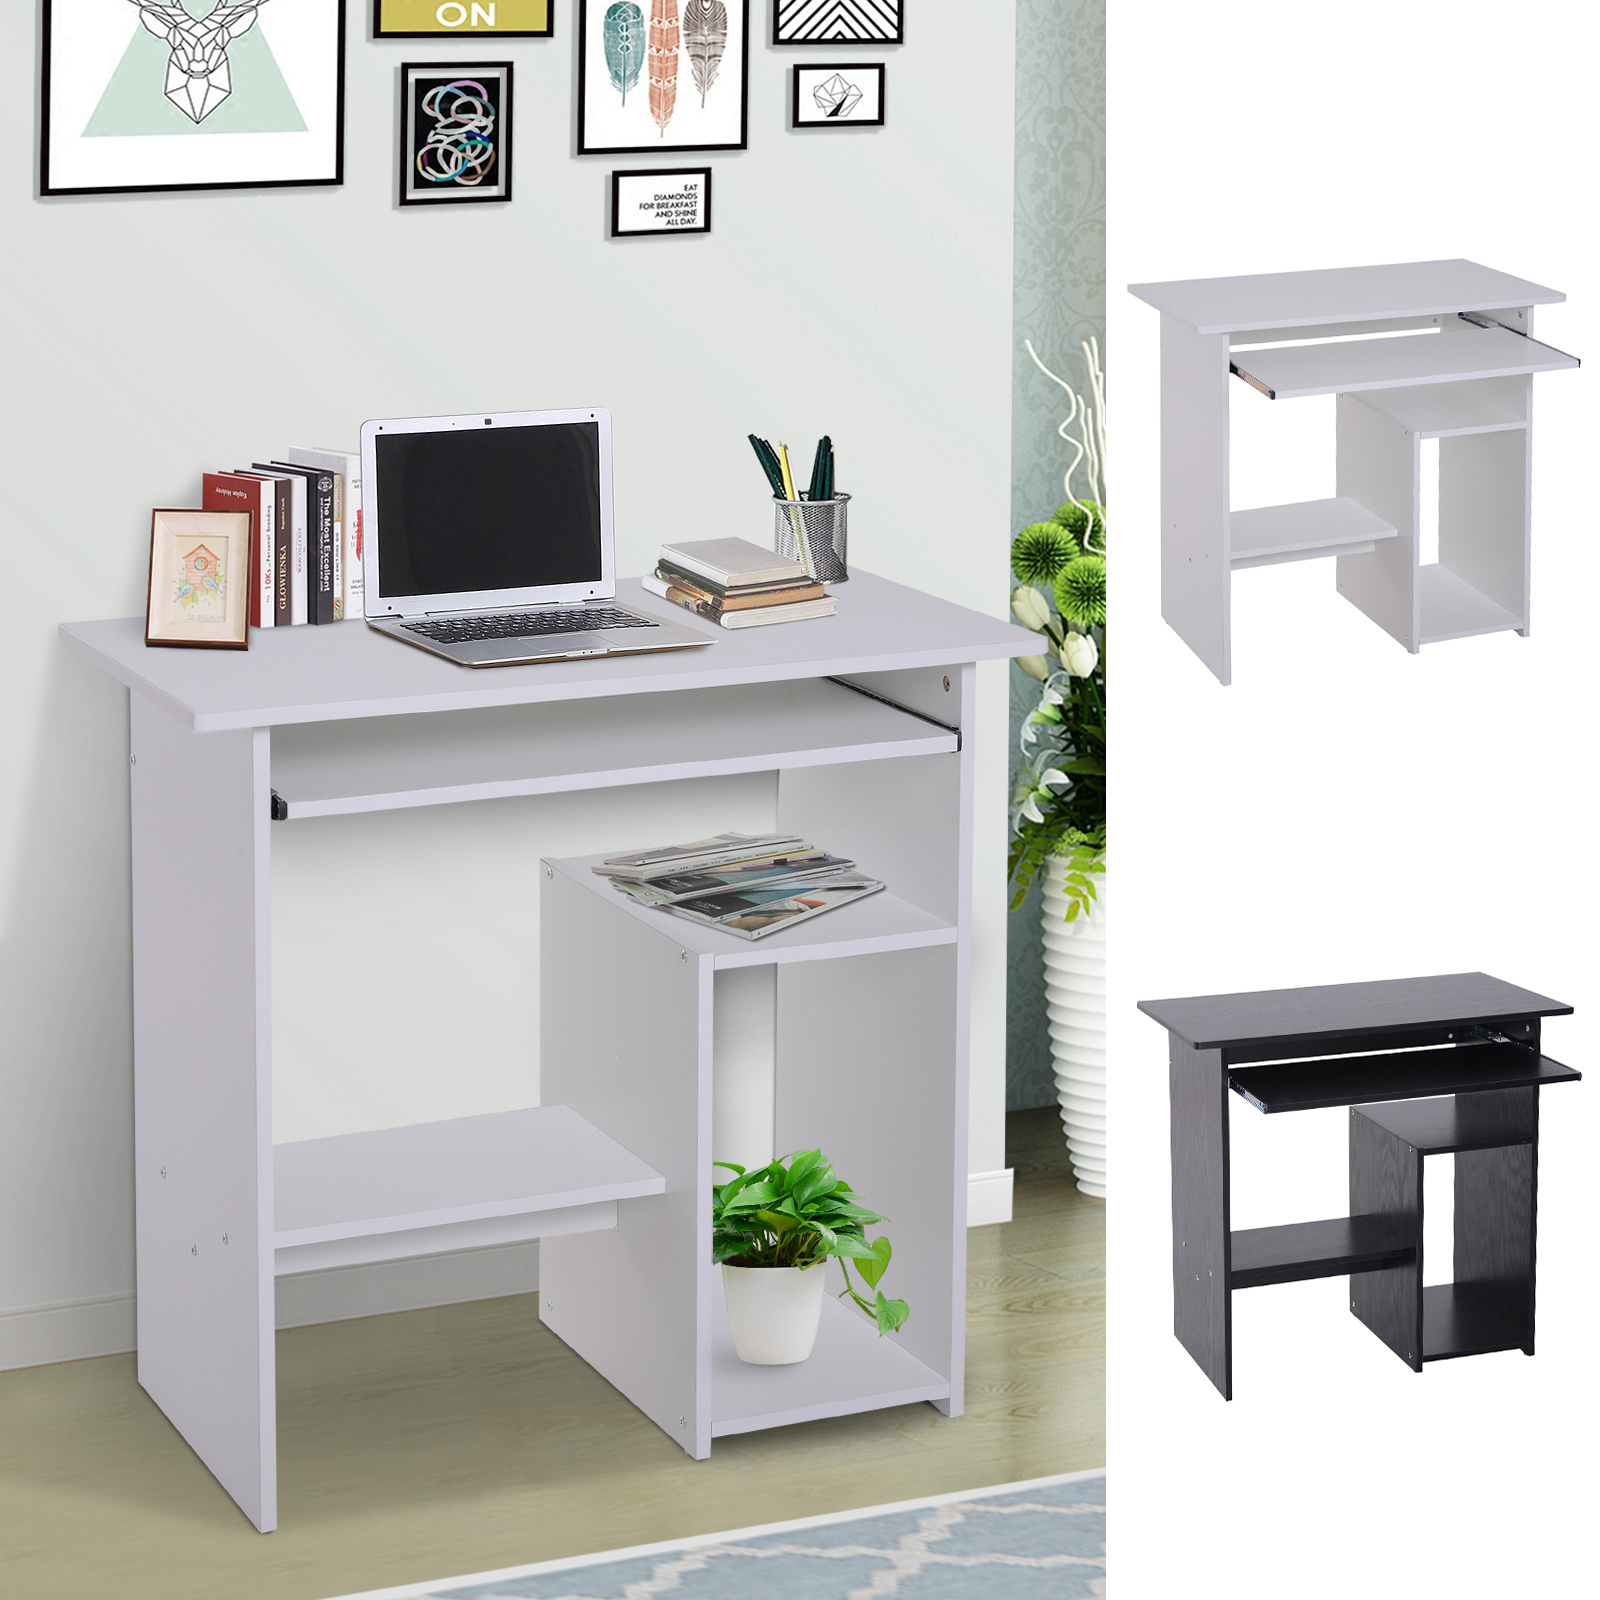 Compact Small Computer Table Wooden Desk Keyboard Tray Storage Shelf Corner Ebay